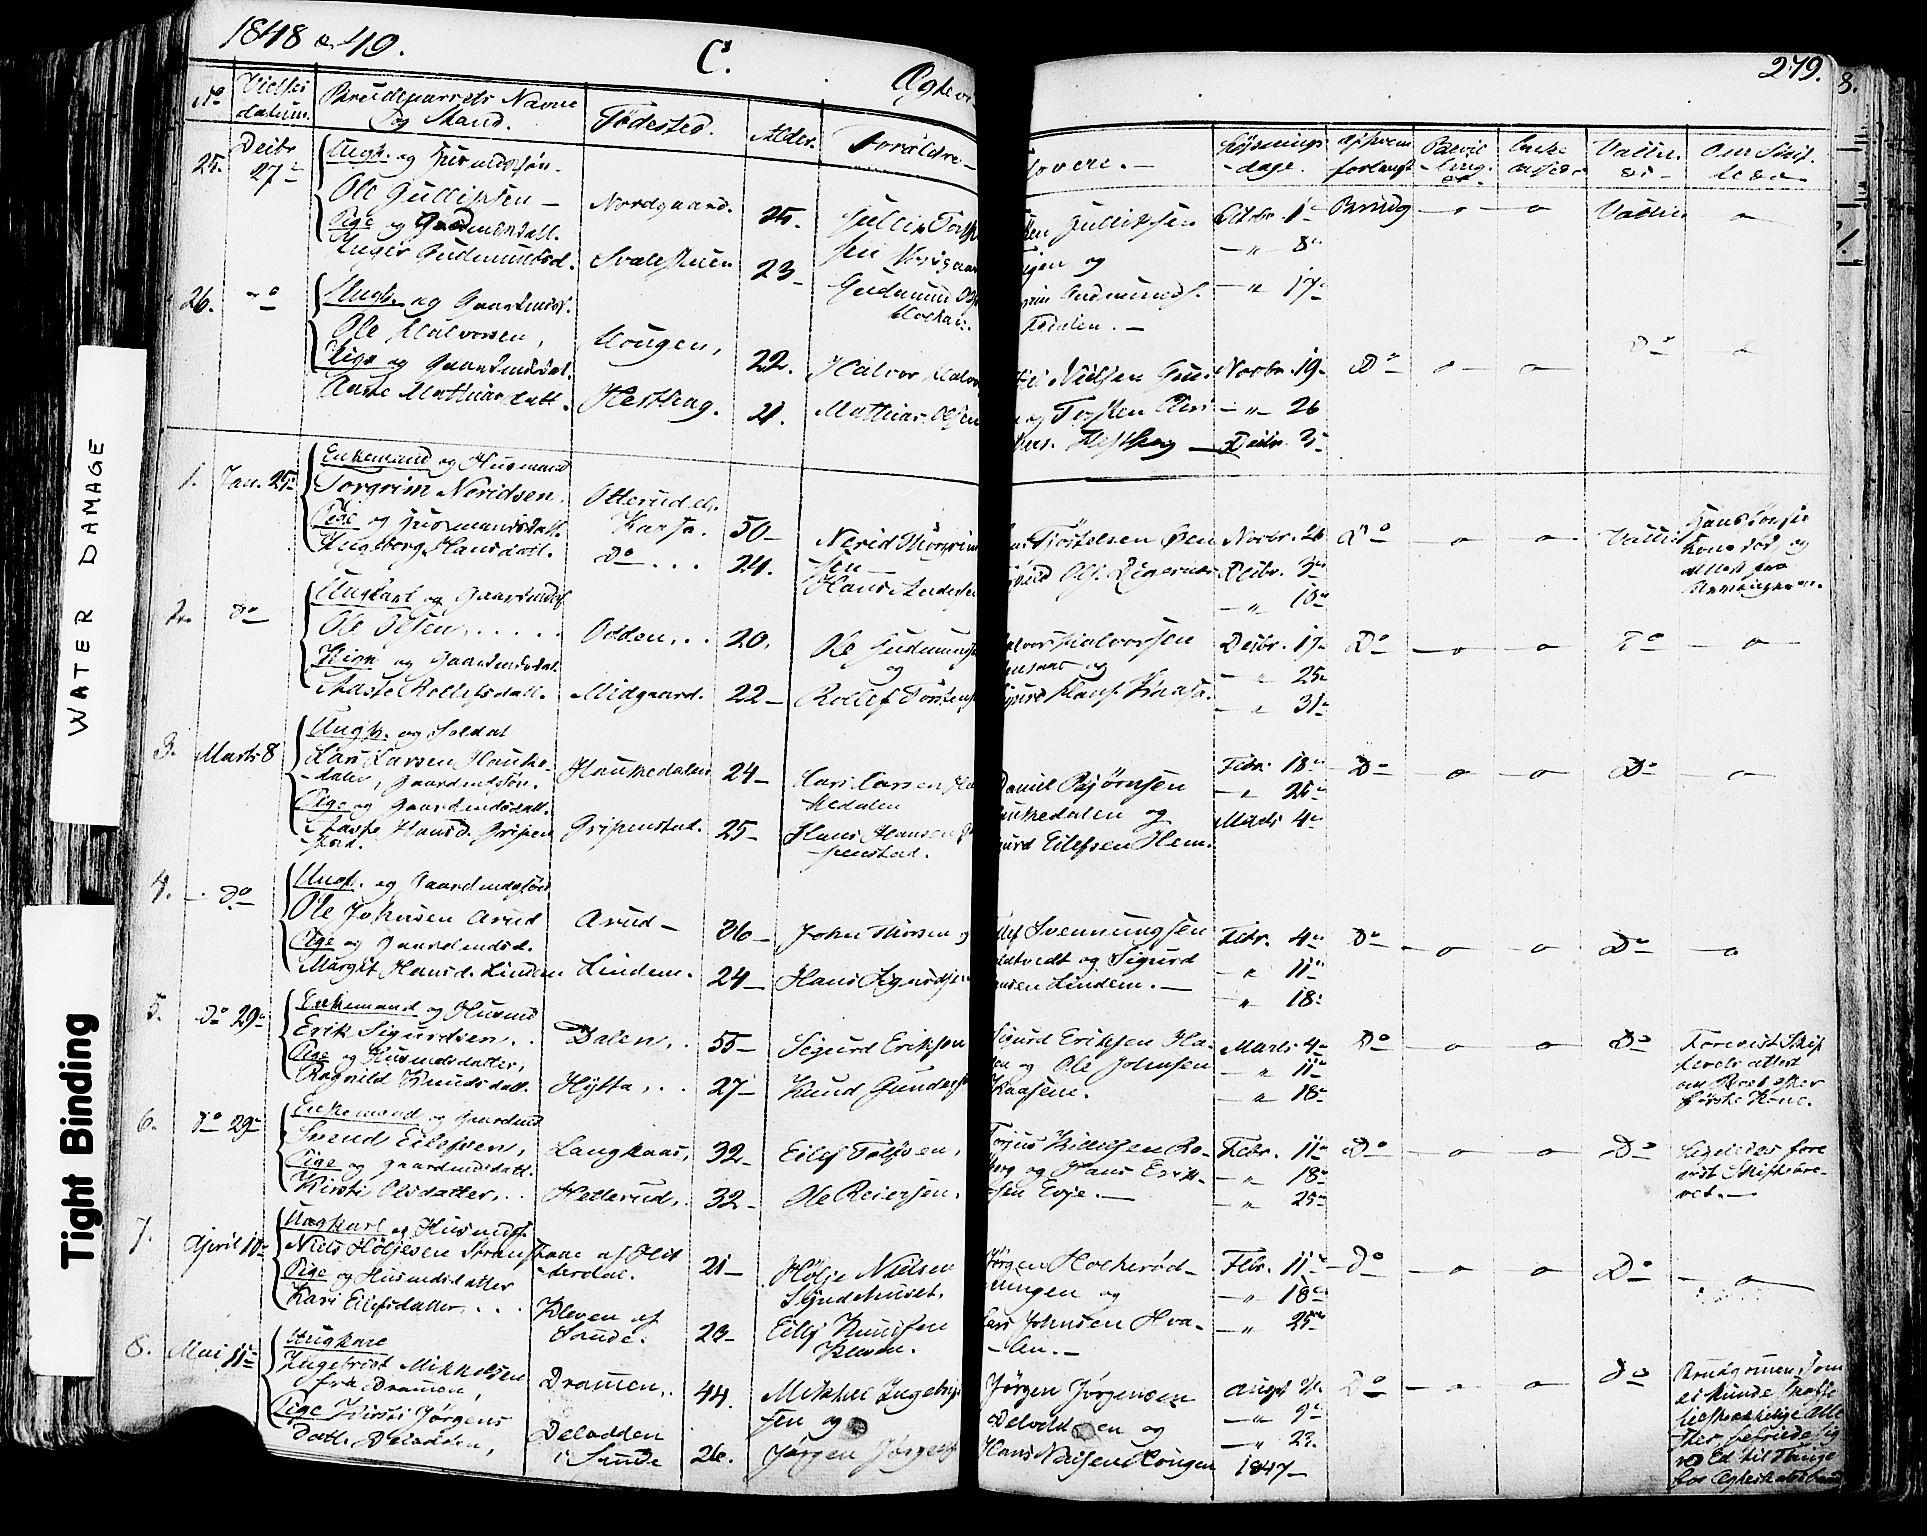 SAKO, Sauherad kirkebøker, F/Fa/L0006: Ministerialbok nr. I 6, 1827-1850, s. 279